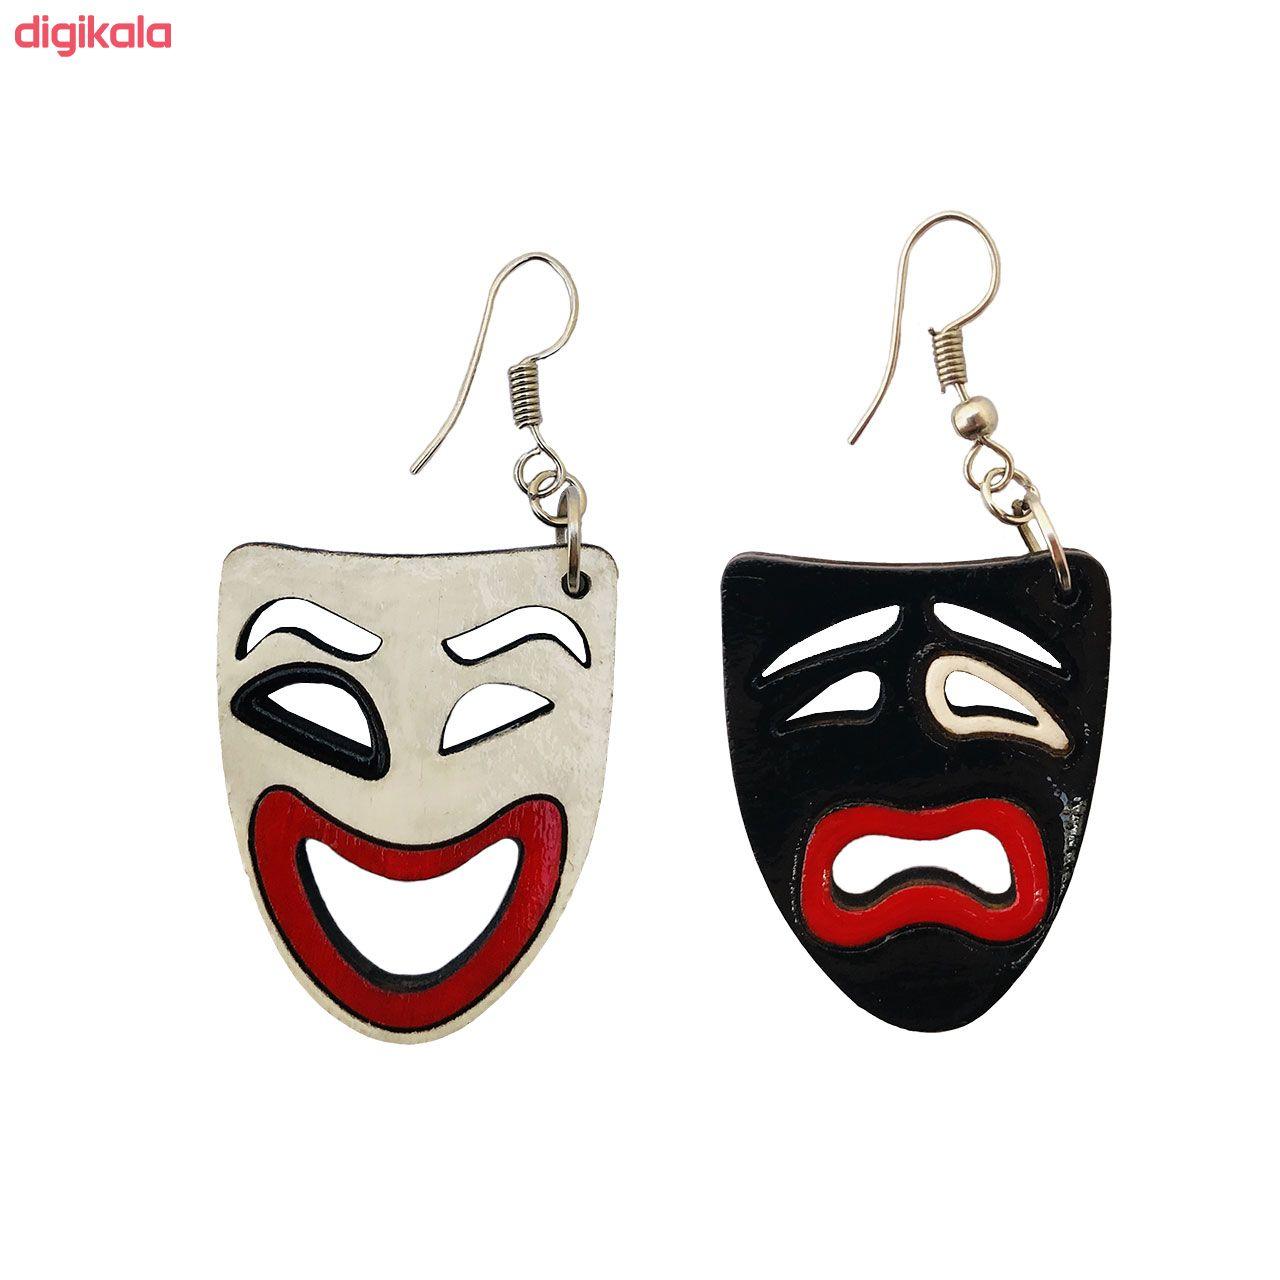 گوشواره زنانه طرح اشک و لبخند کد 012 main 1 1